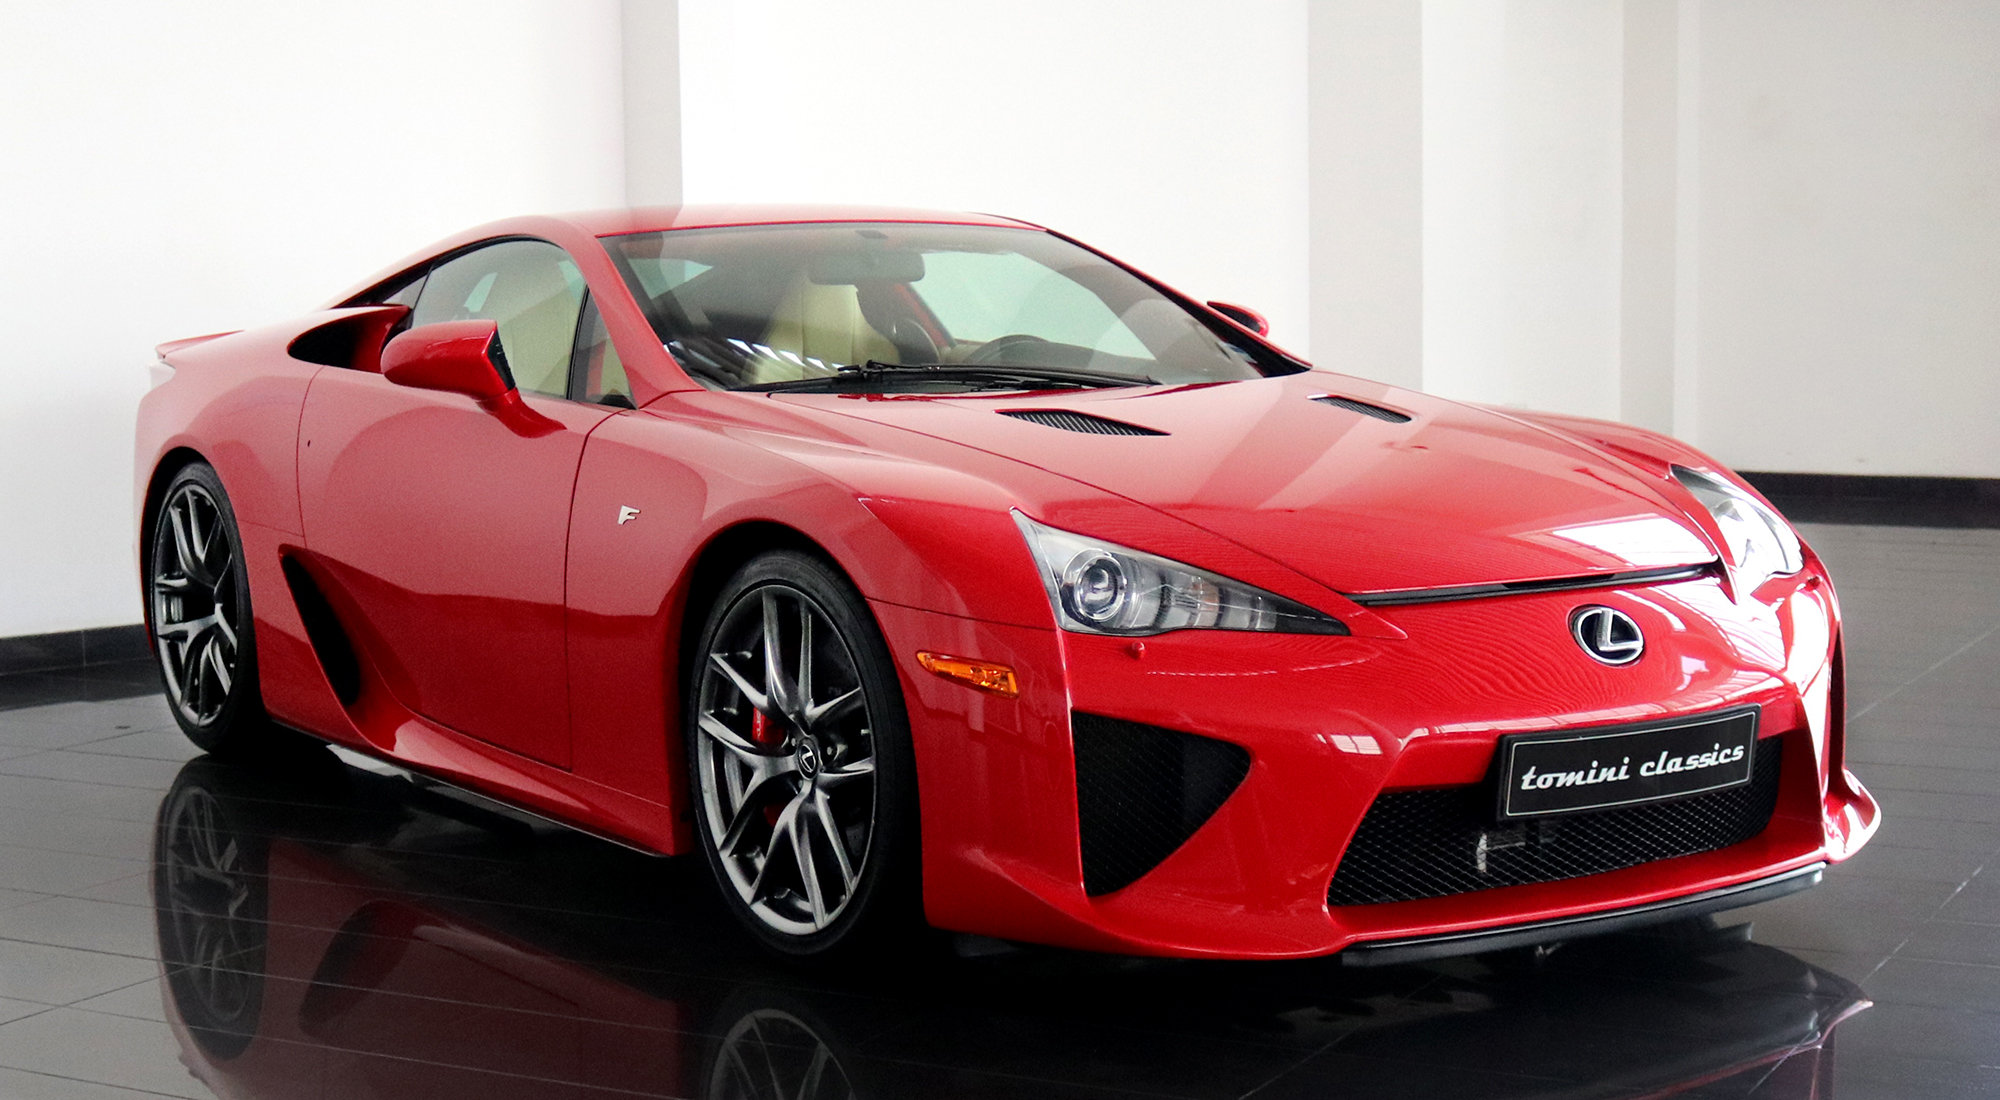 Lexus LFA (2012) For Sale (picture 1 of 6)